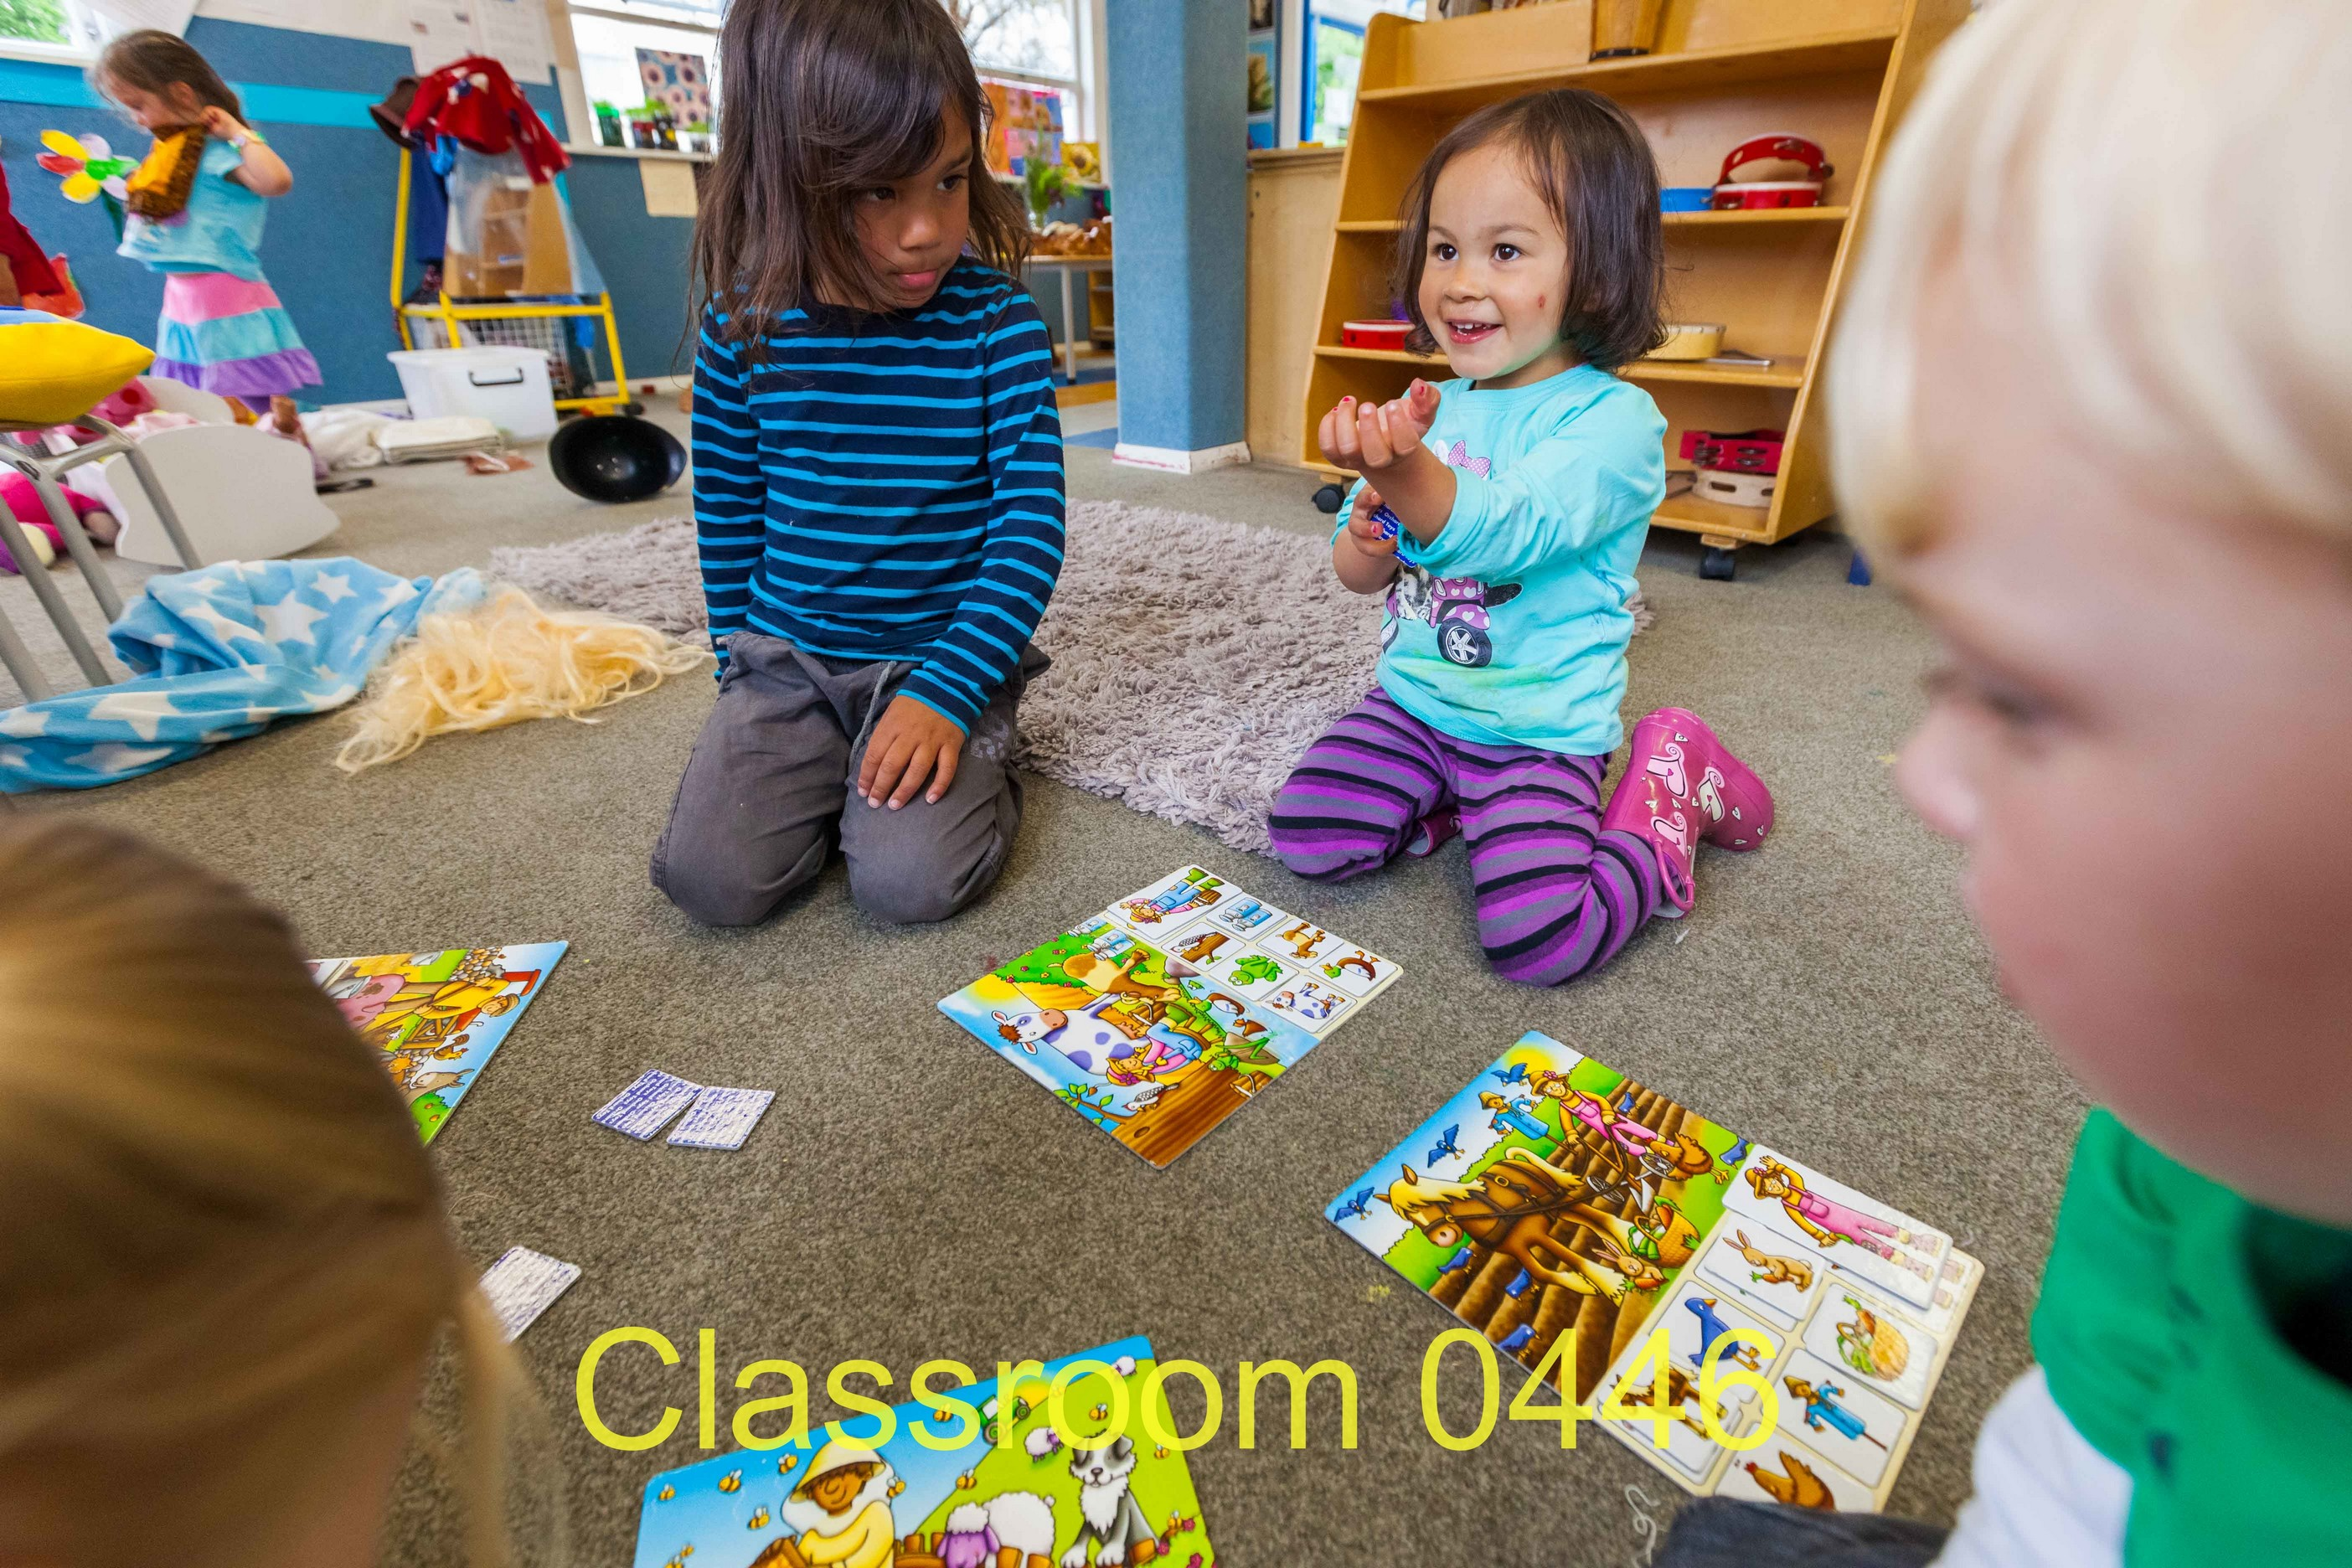 Classroom 0446